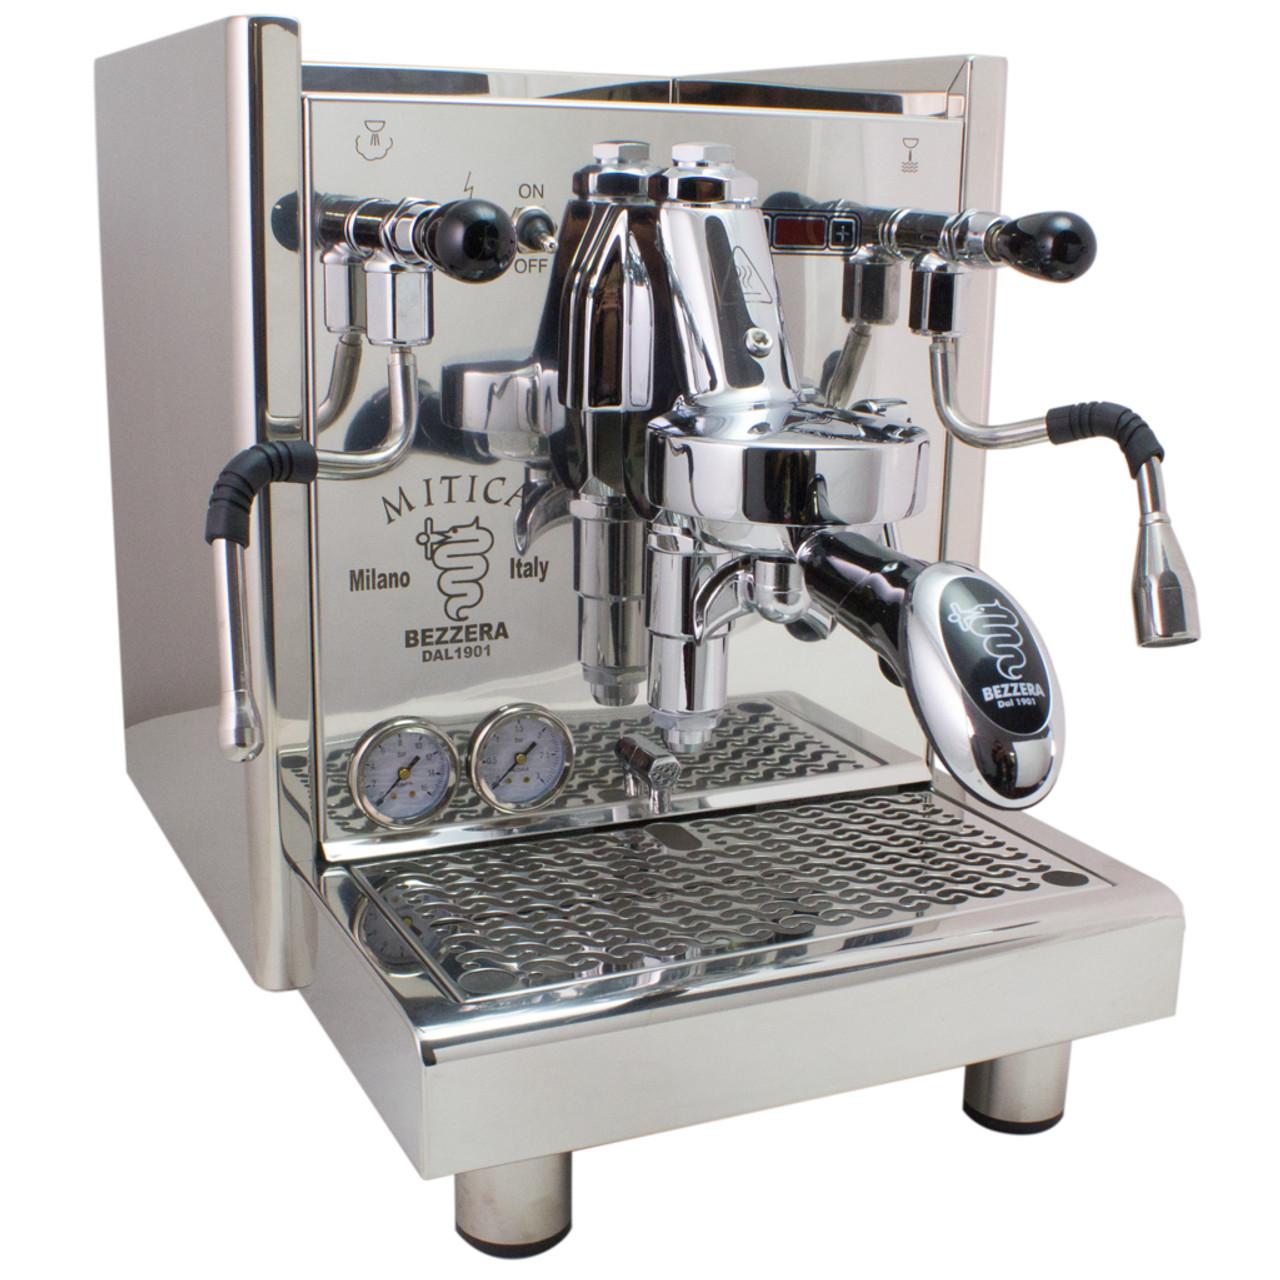 Bezzera Mitica Pid Commercial Espresso Machine Switchable Tank